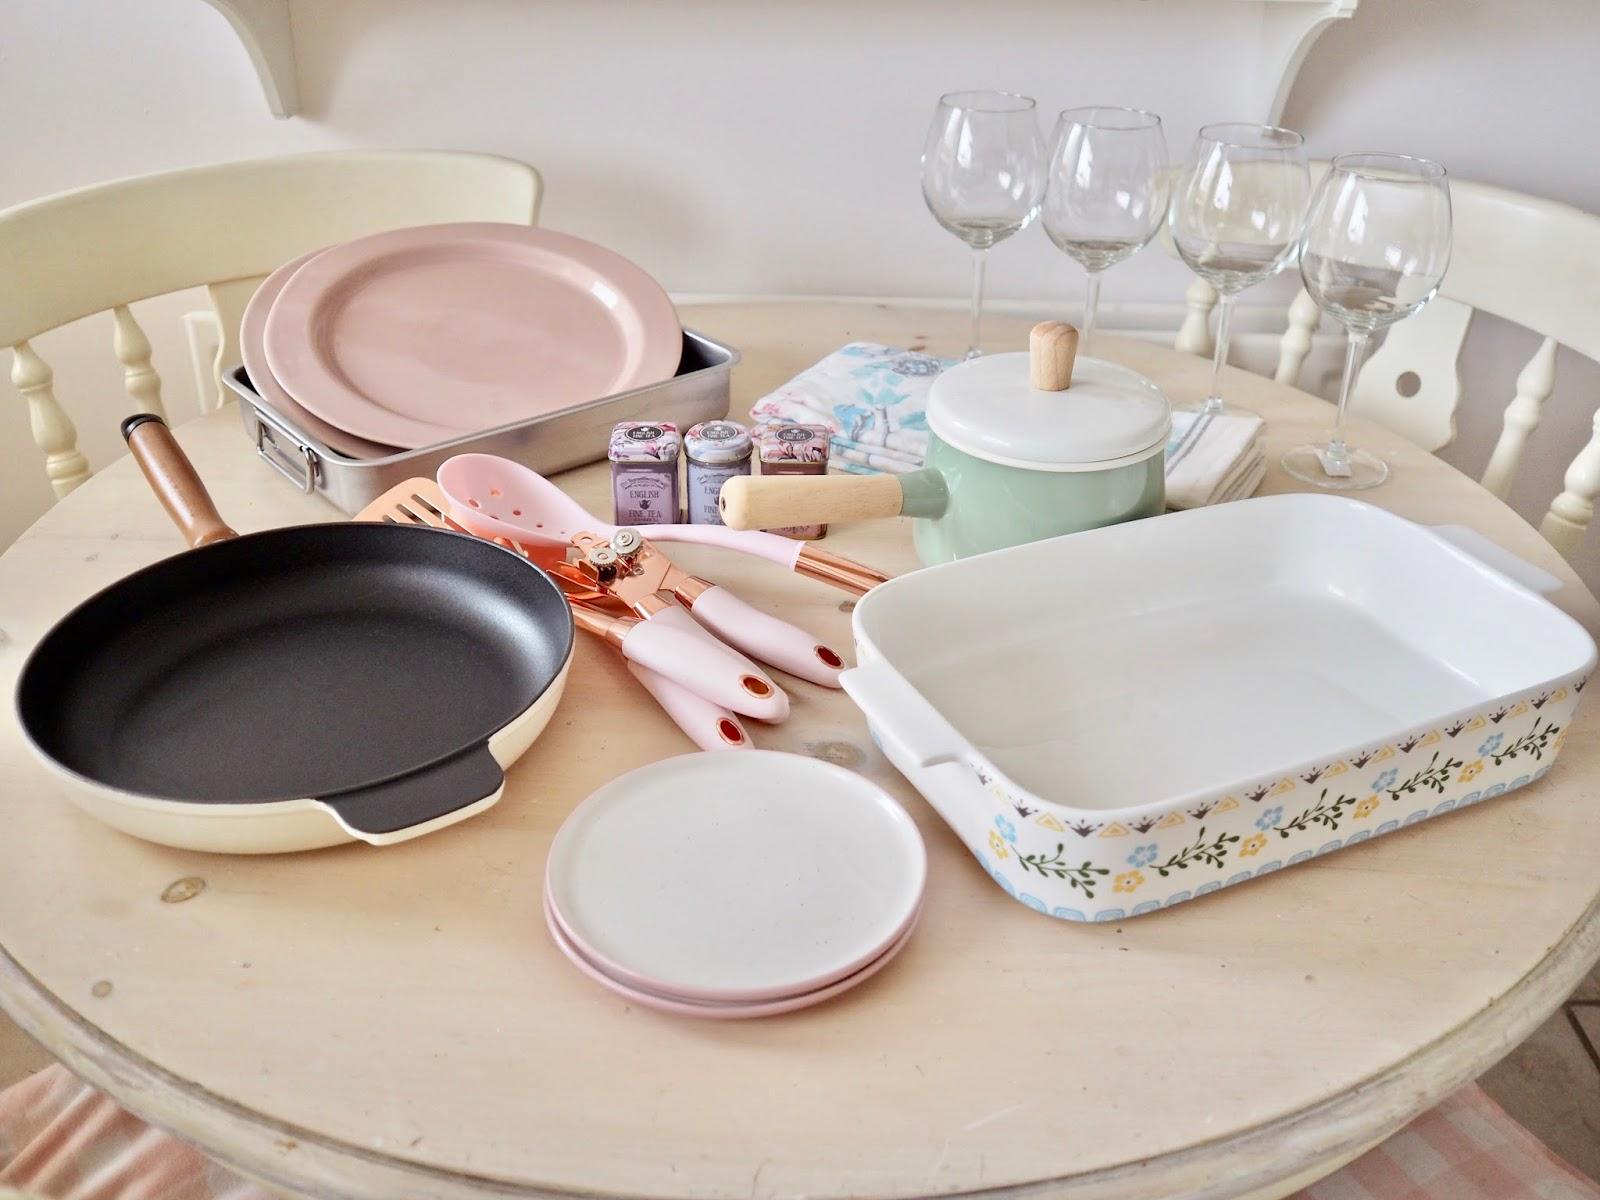 homeware haul   new kitchenware - dainty dress diaries